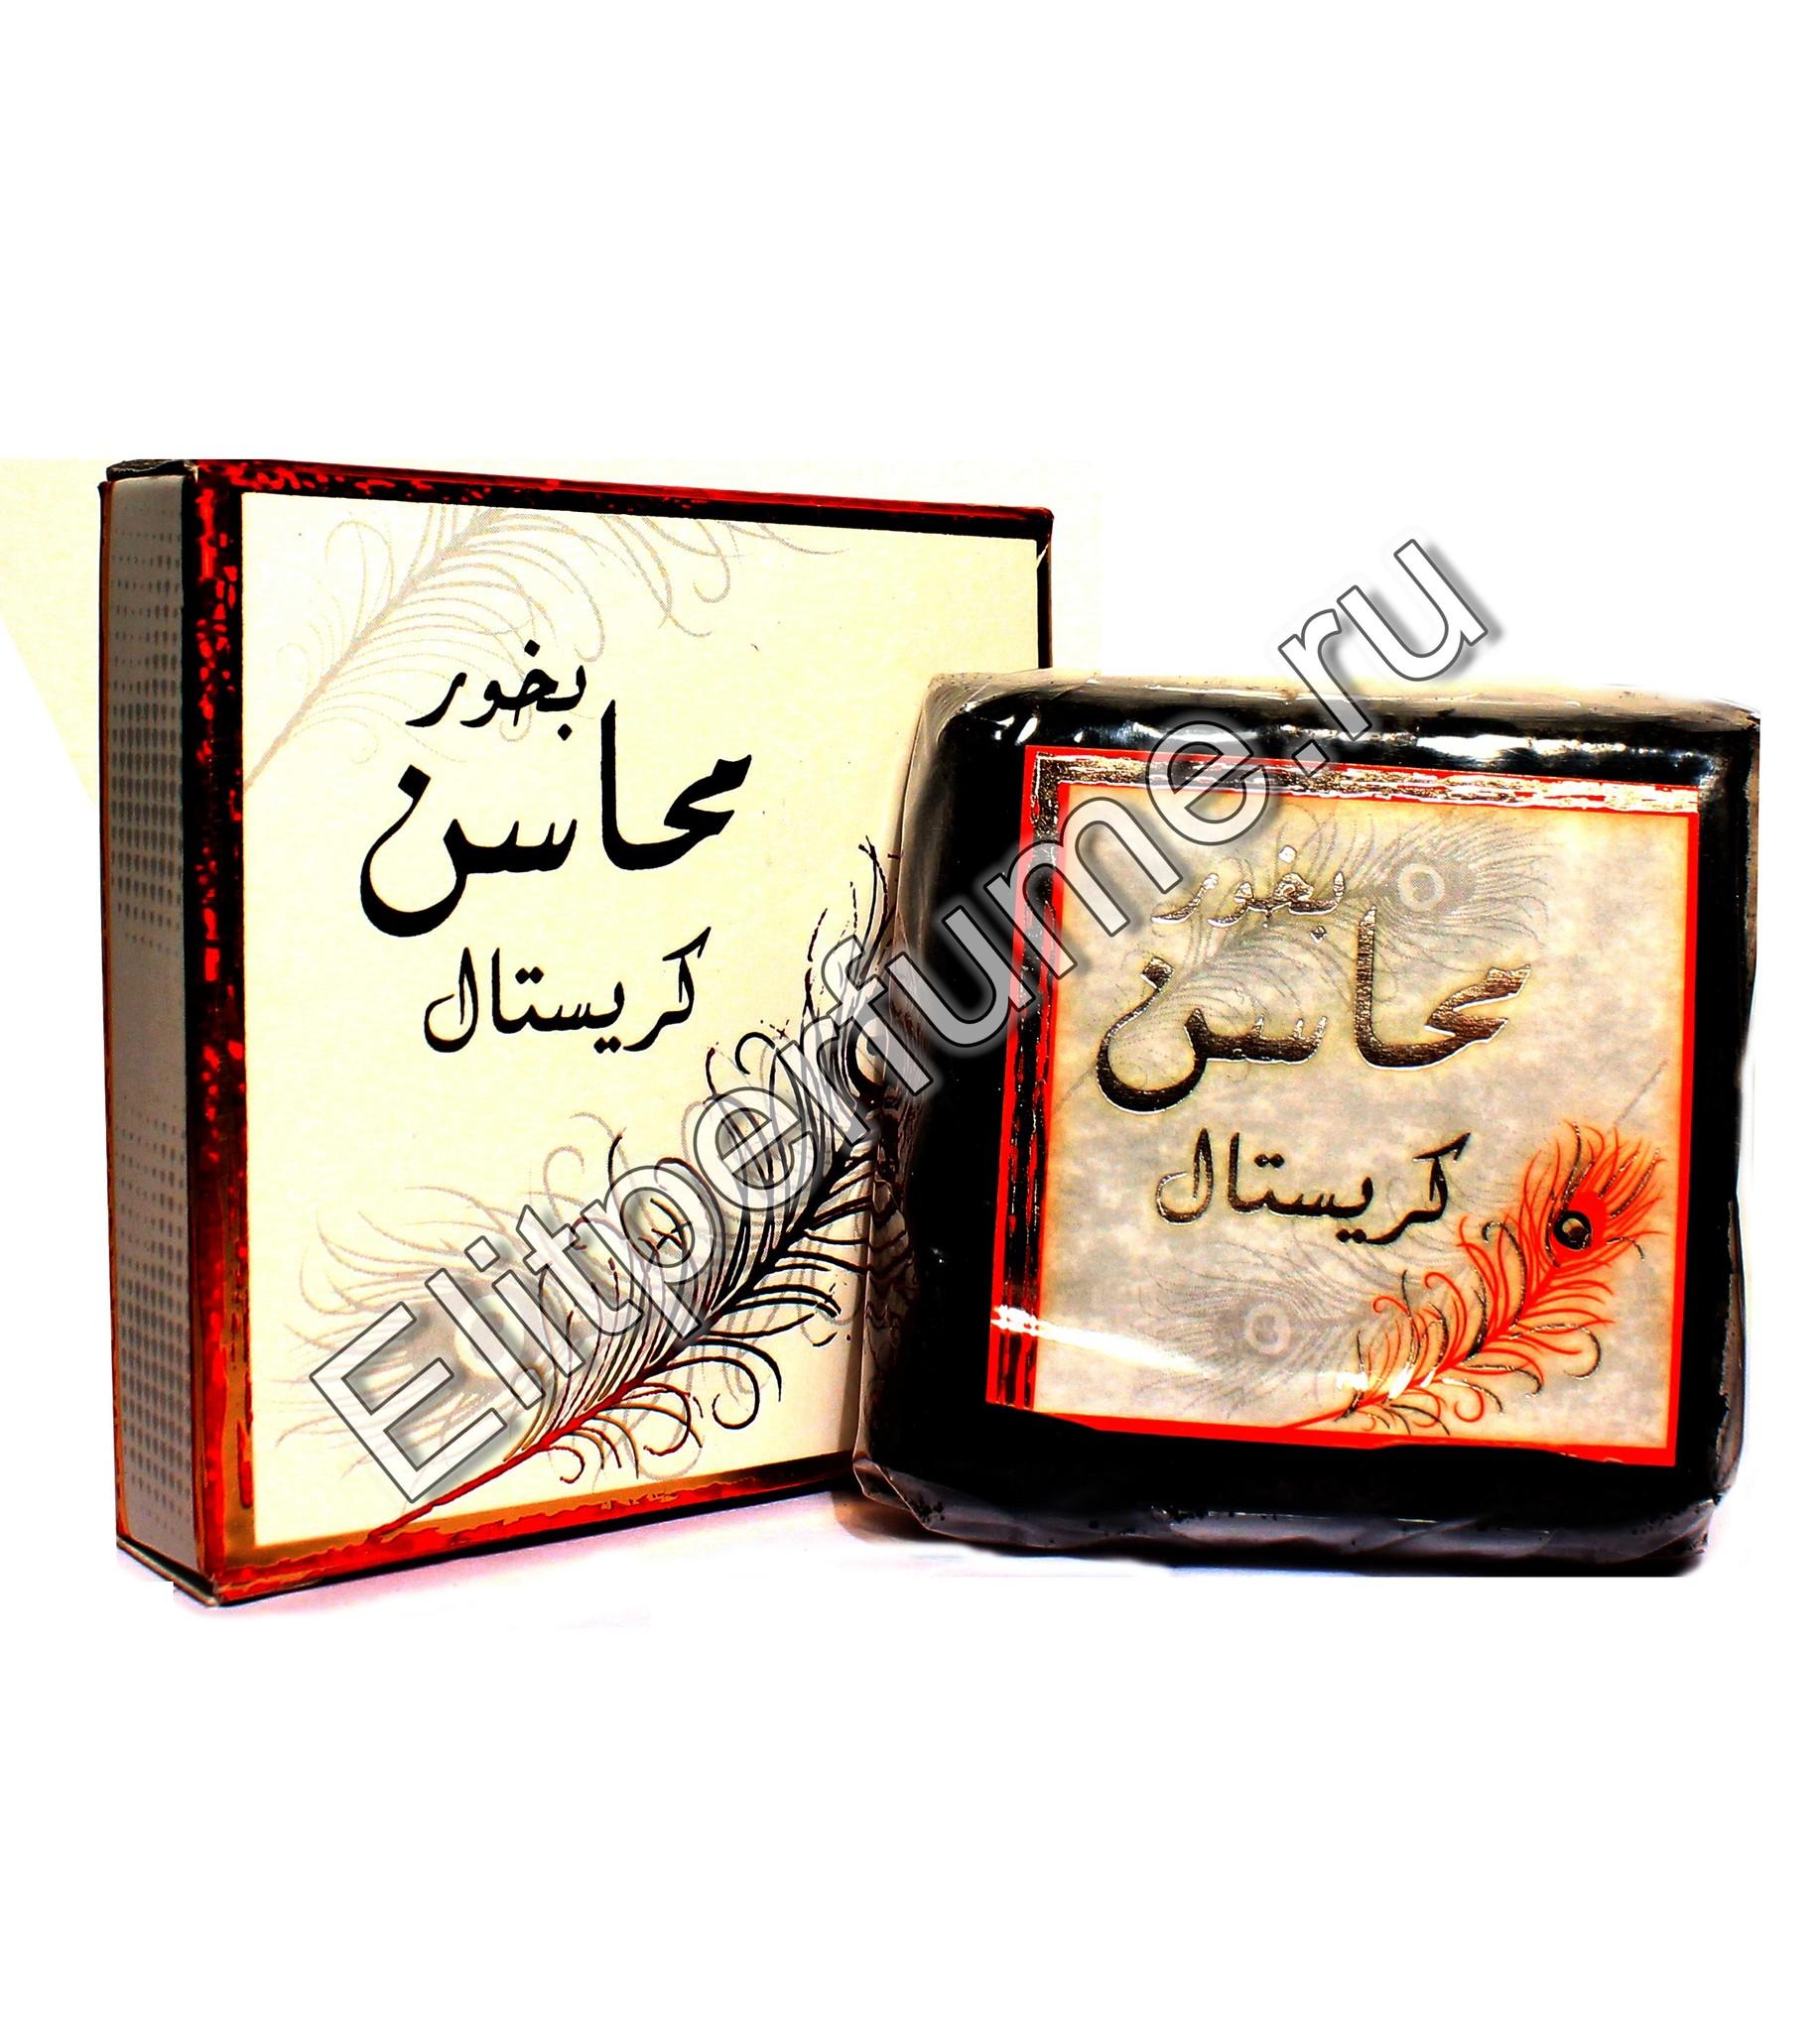 Bakhoor Mahasin Crystal Бахур Махазин Кристалл 40 гр. аромосмесь от Ард Аль Заафаран Ard Al Zaafaran